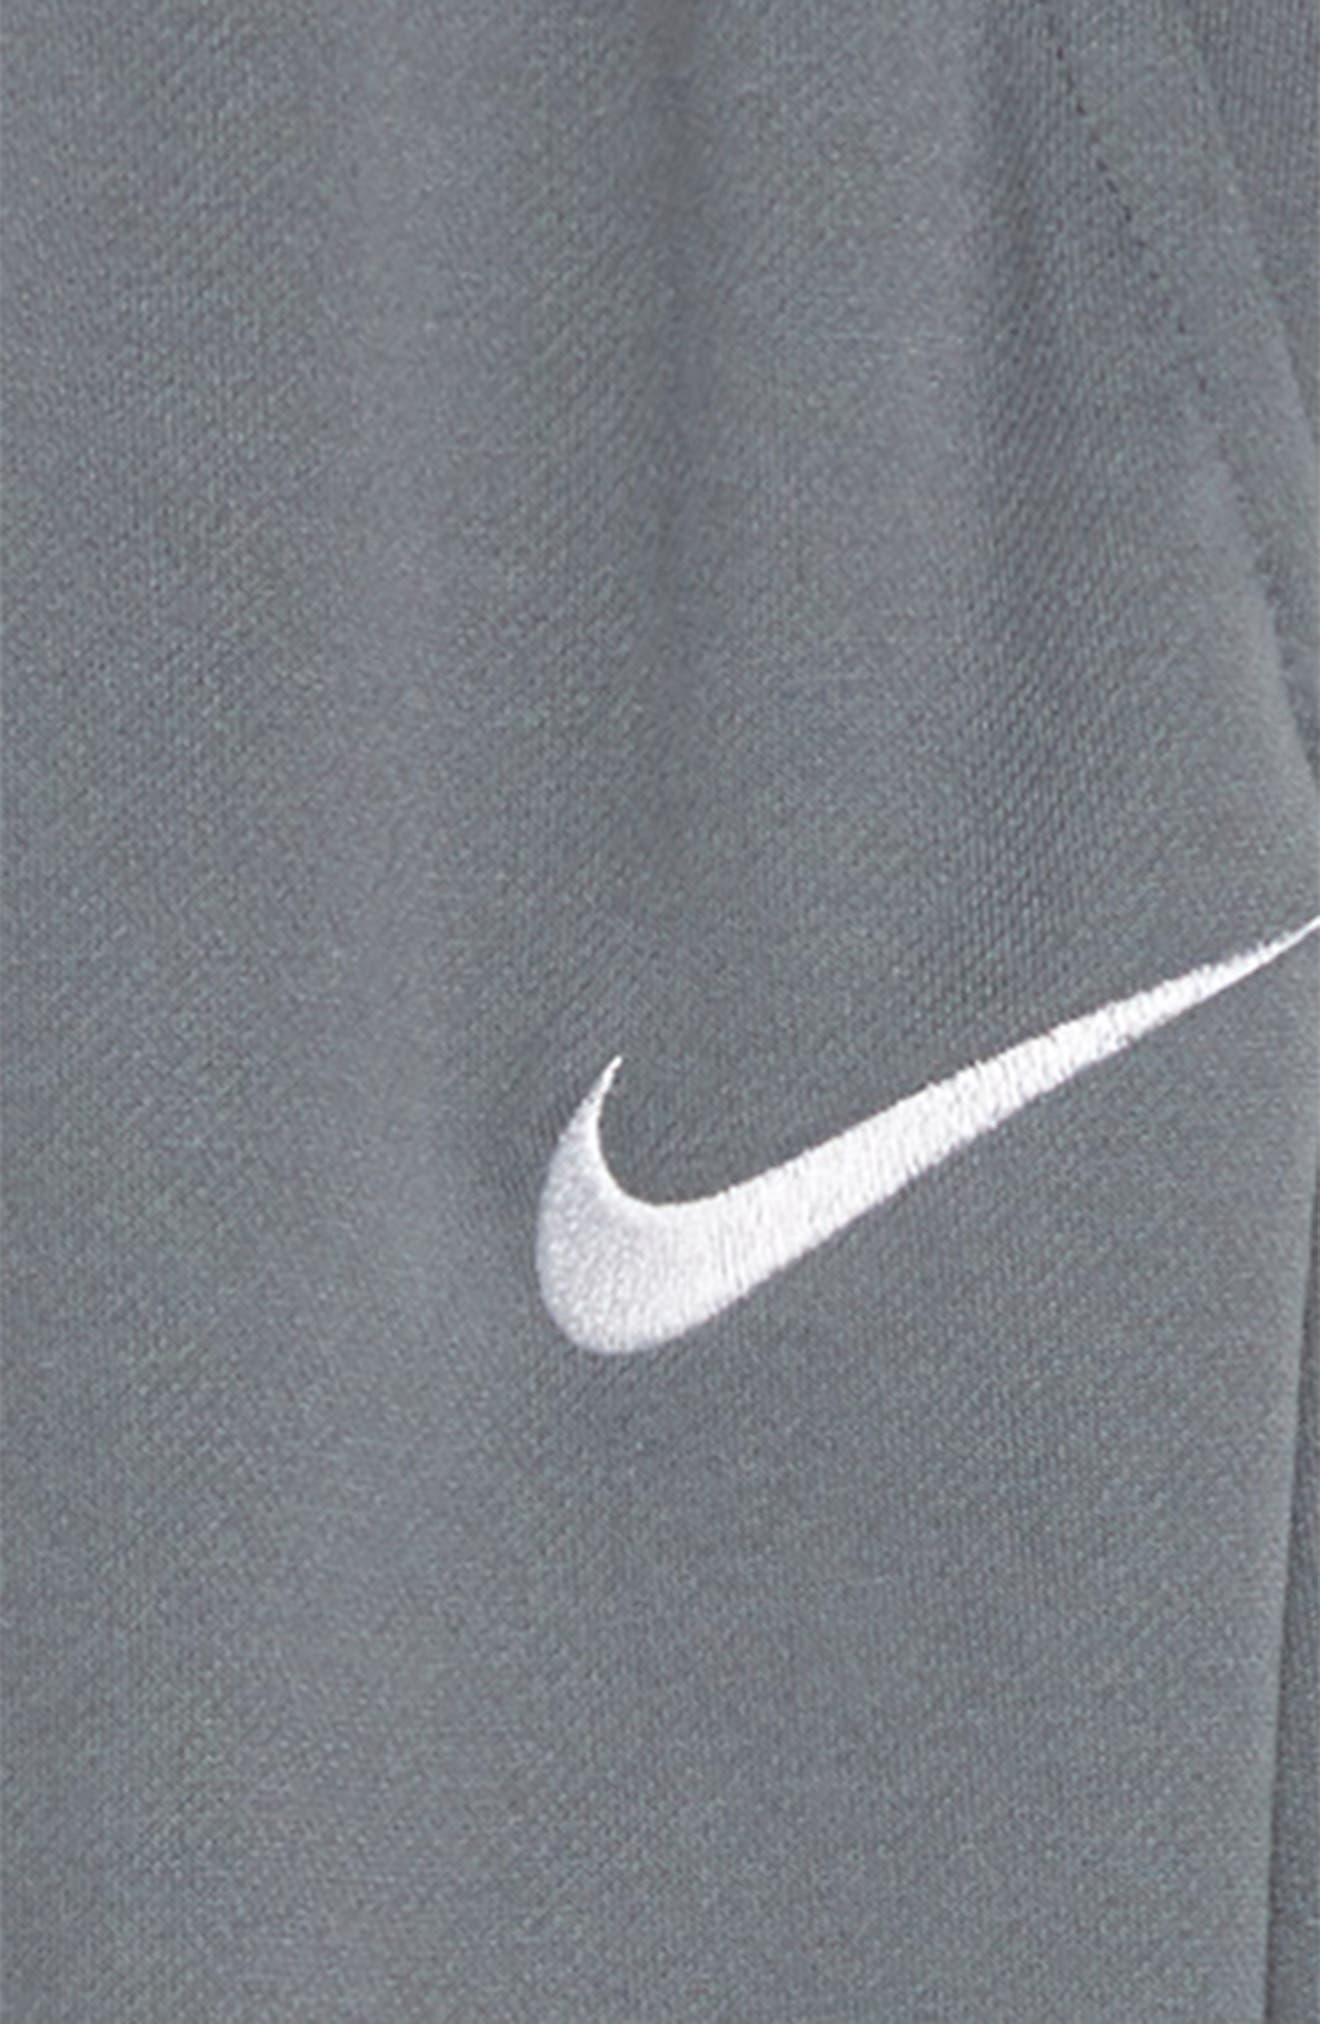 Dry Fleece Training Pants,                             Alternate thumbnail 2, color,                             065